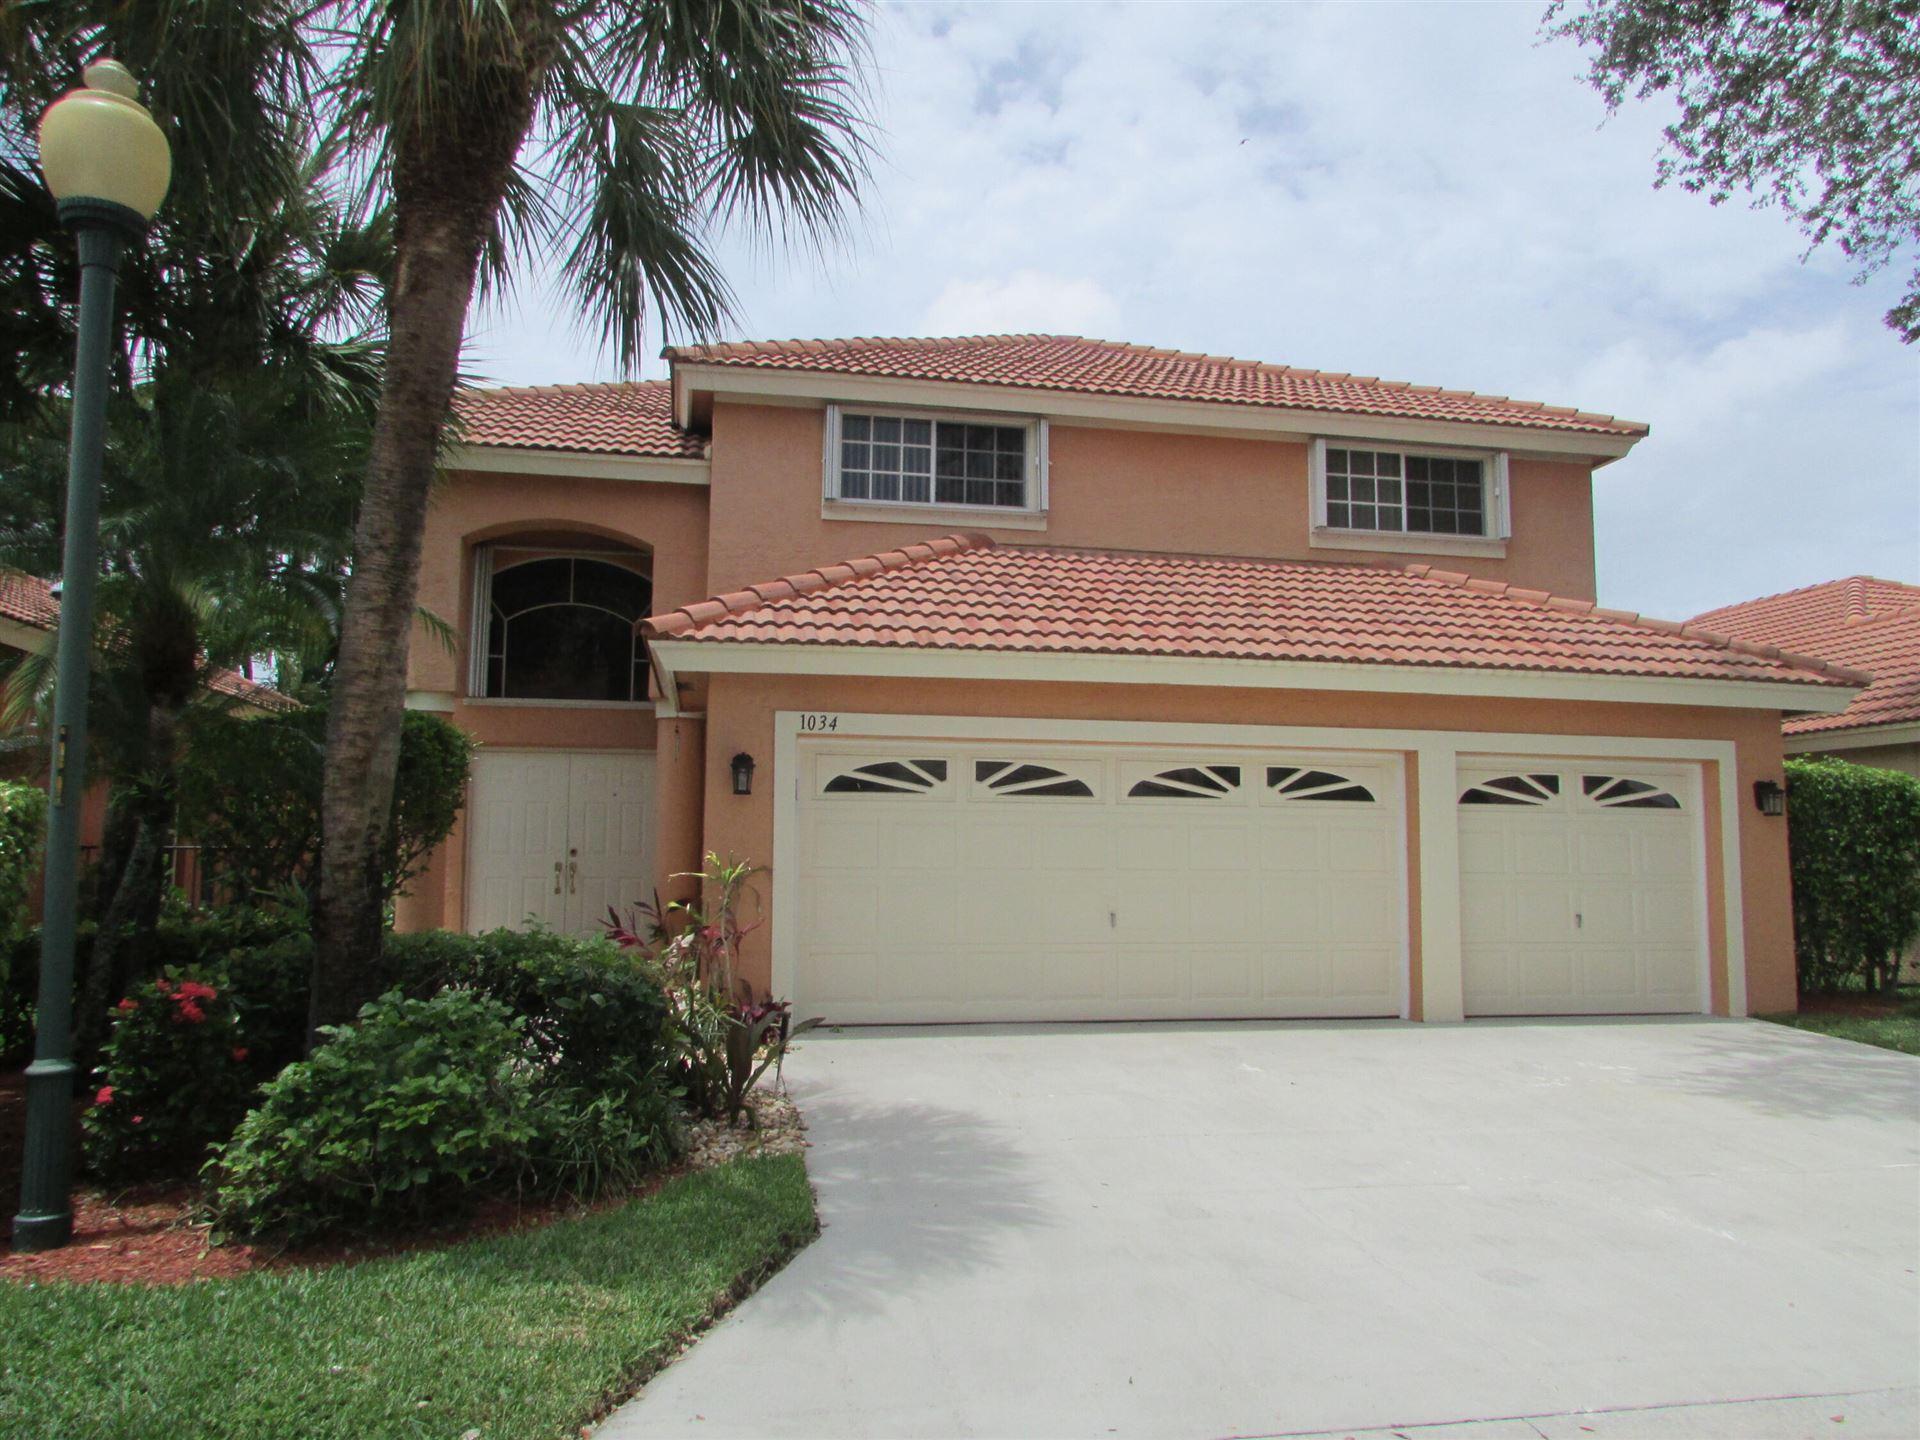 1034 Aspri Way, Riviera Beach, FL 33418 - #: RX-10725345